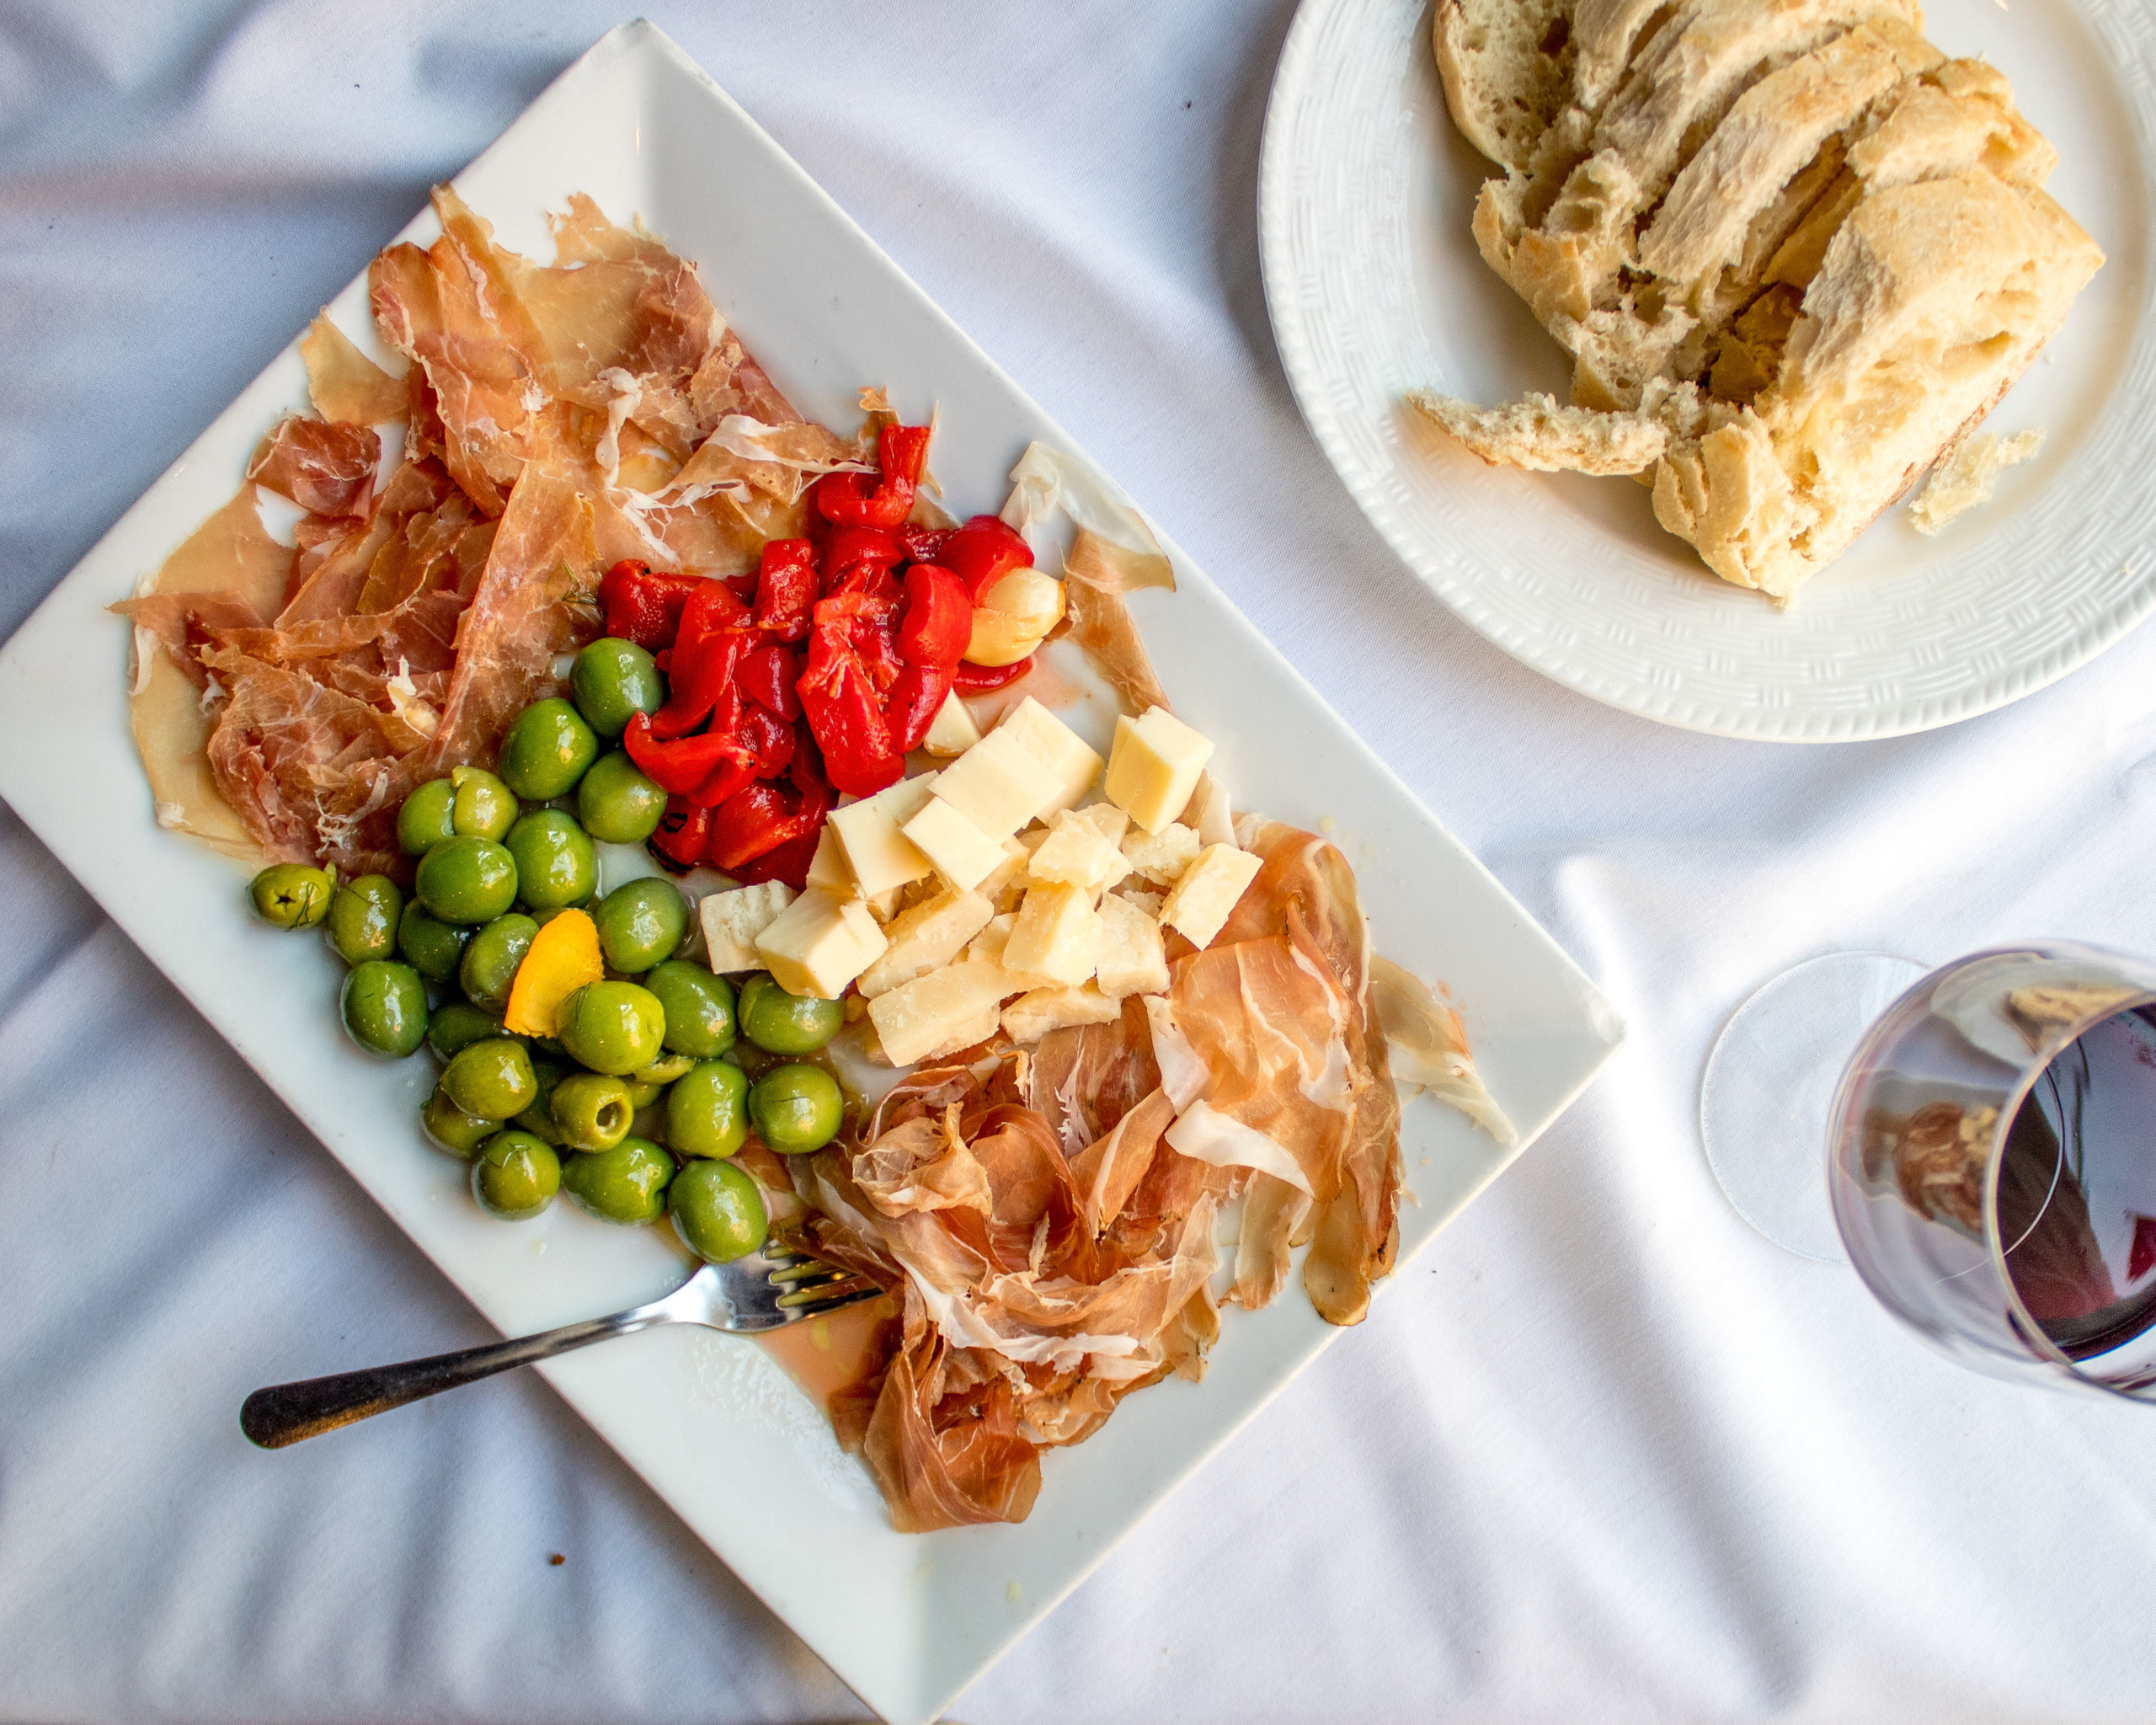 Prima Cucina Italiana